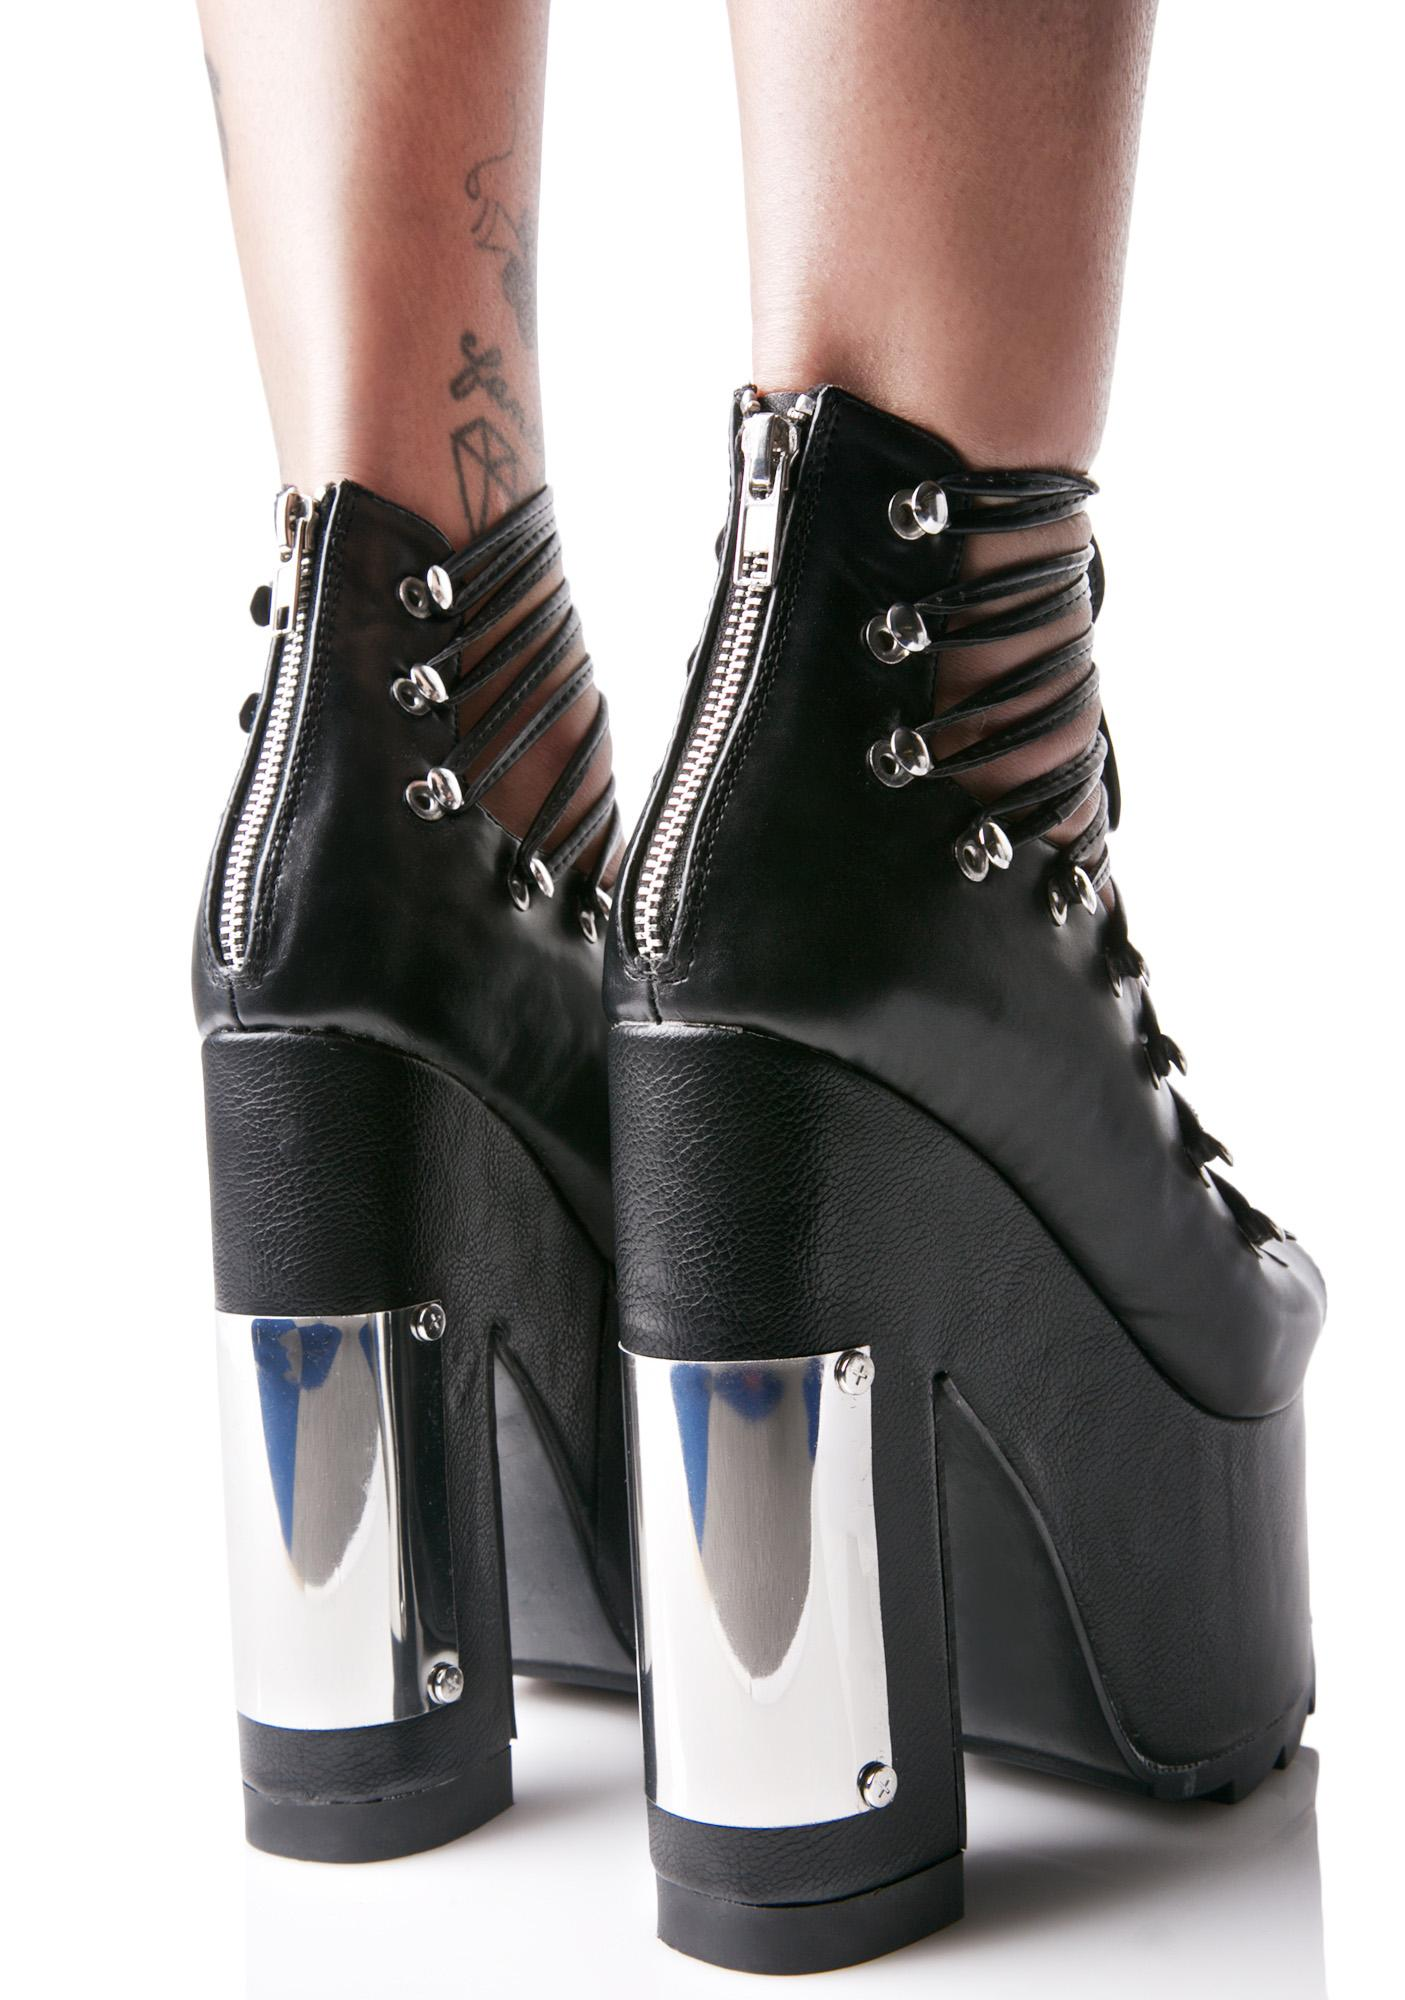 Y.R.U. Heavy Metal Ballet Bae Platforms